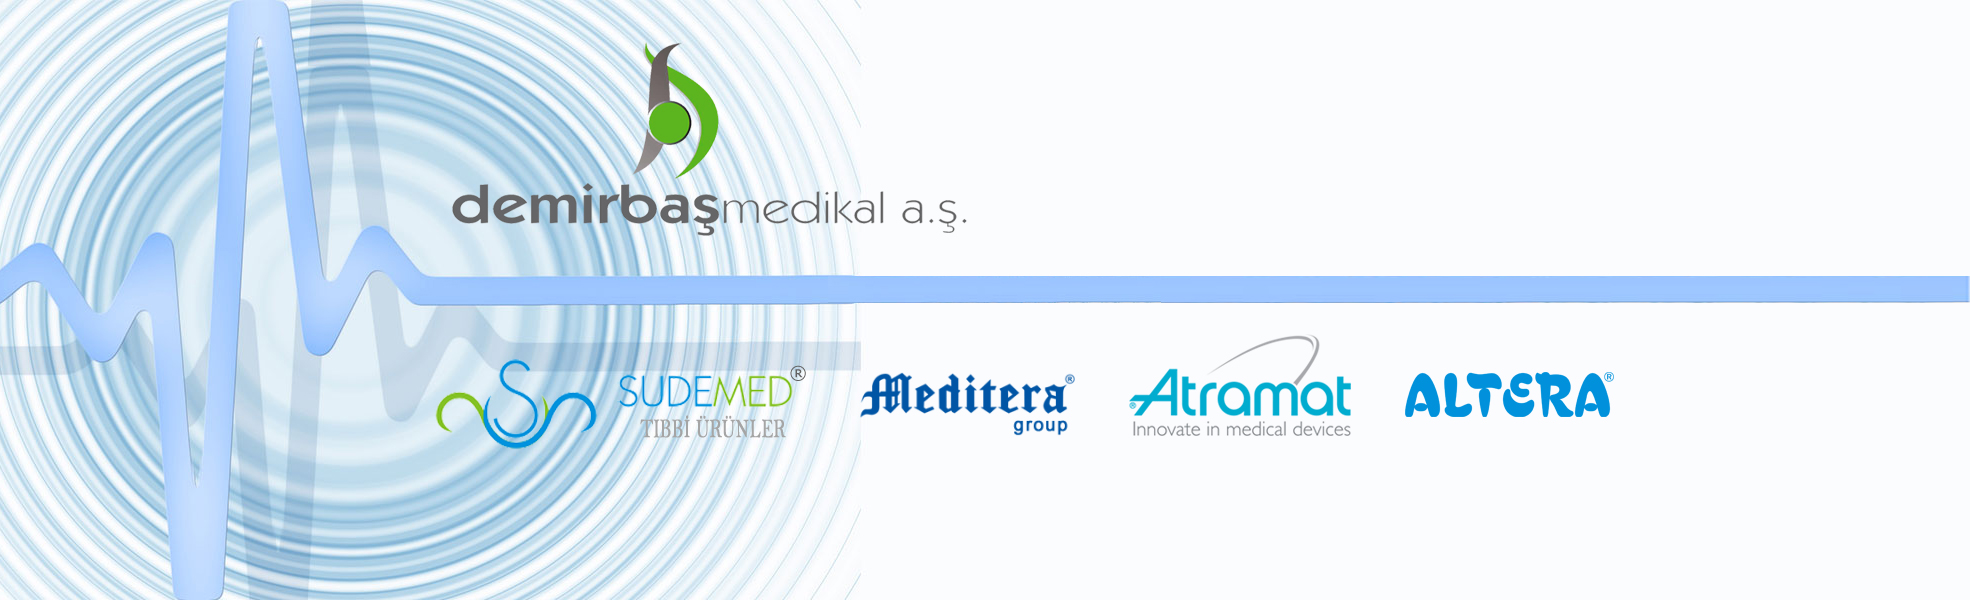 Sudemed Medikal DEMİRBAŞ MEDİKAL